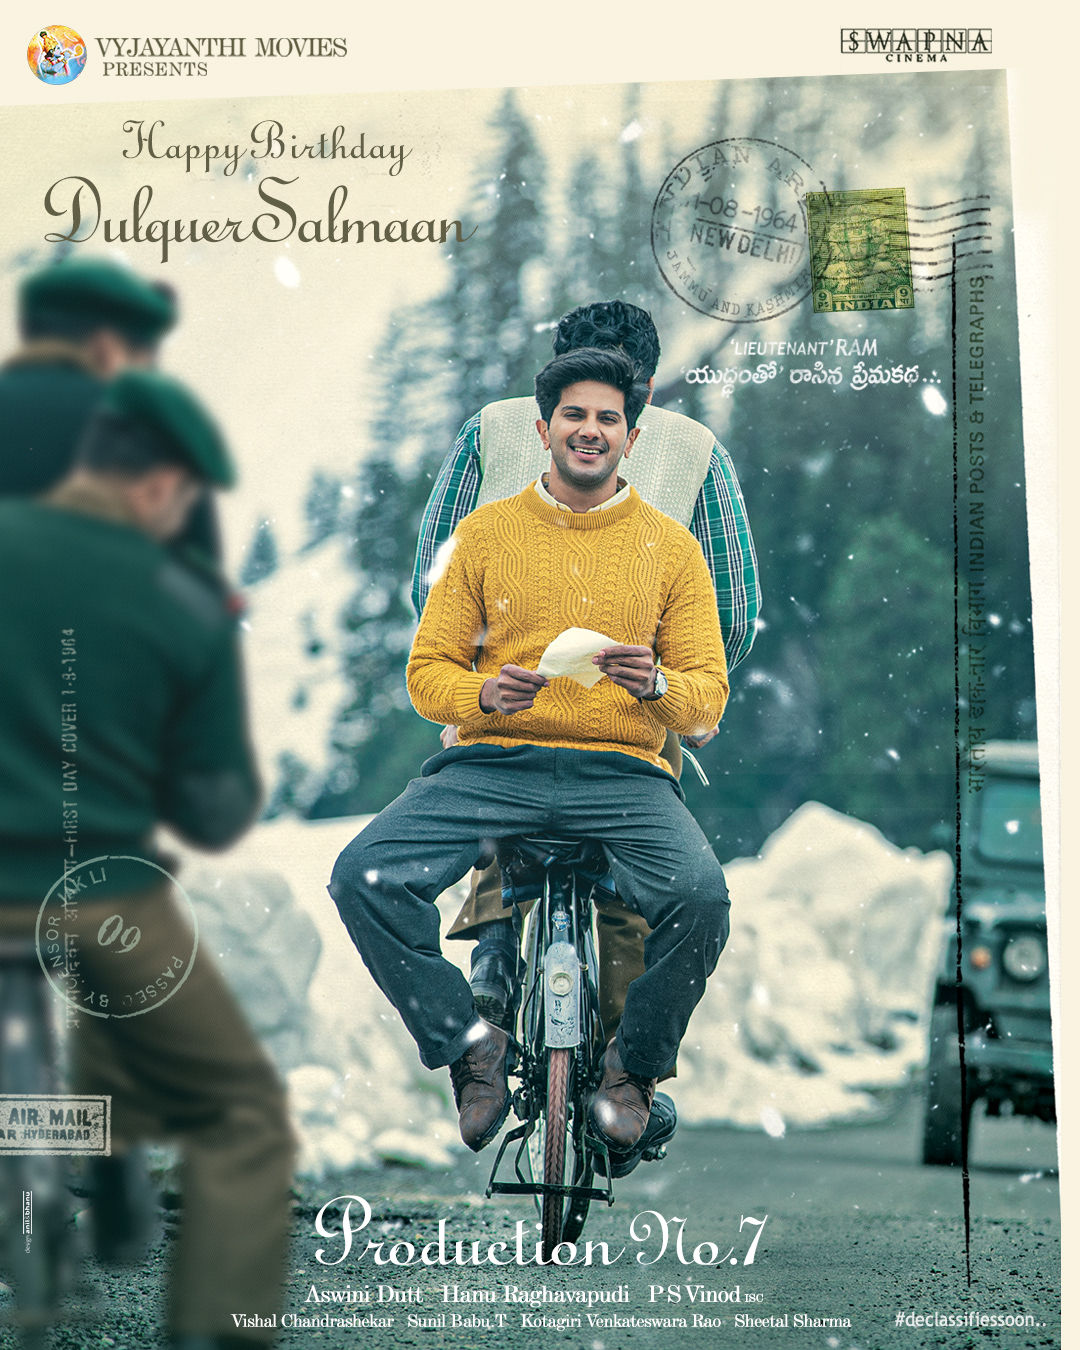 Dulquer Salman Birthday Glimpse Of 'Lieutenant' RAM Unveiled